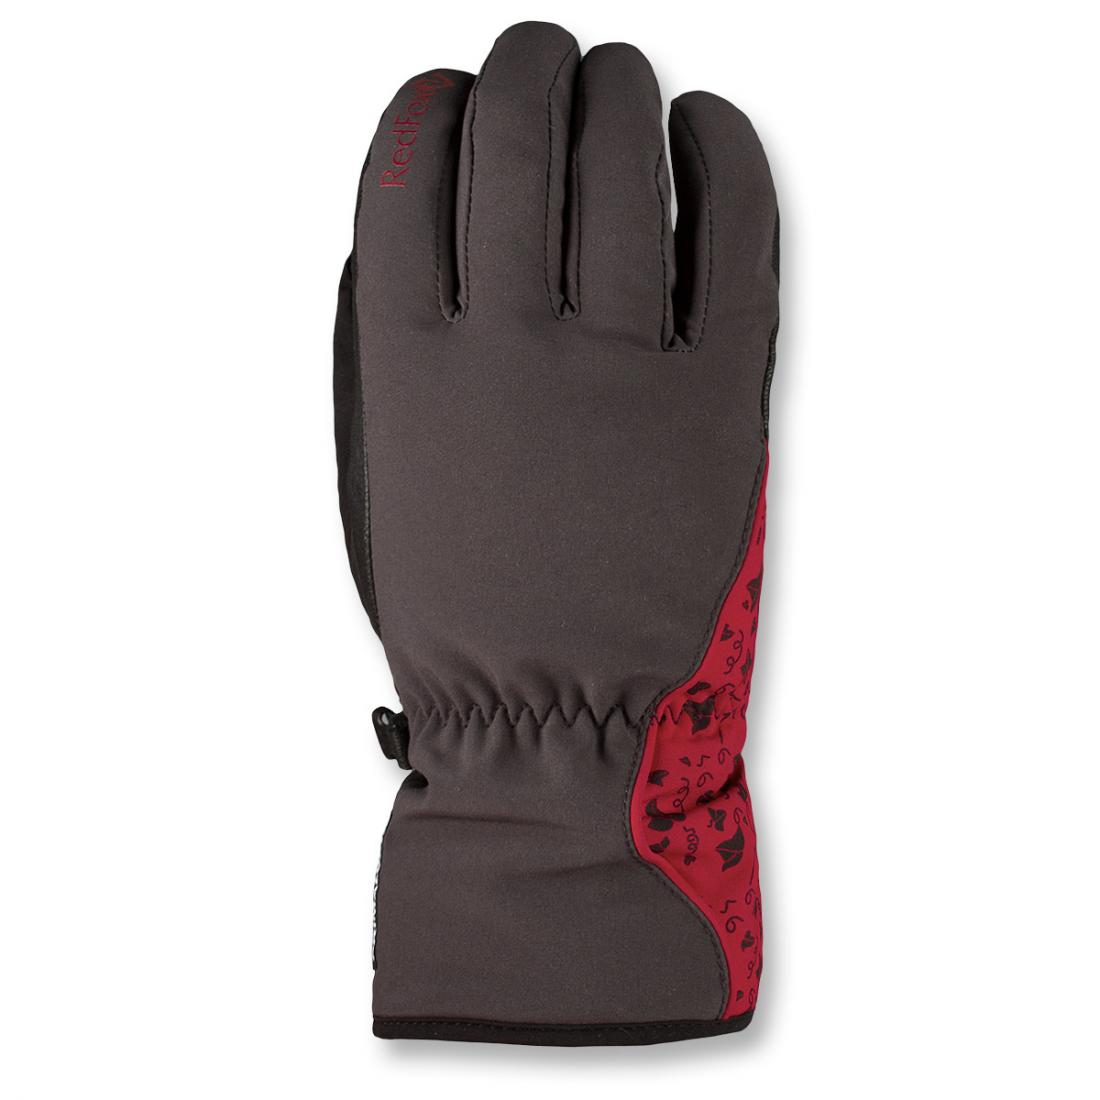 Перчатки женские RozaryПерчатки<br><br><br>Цвет: Красный<br>Размер: L